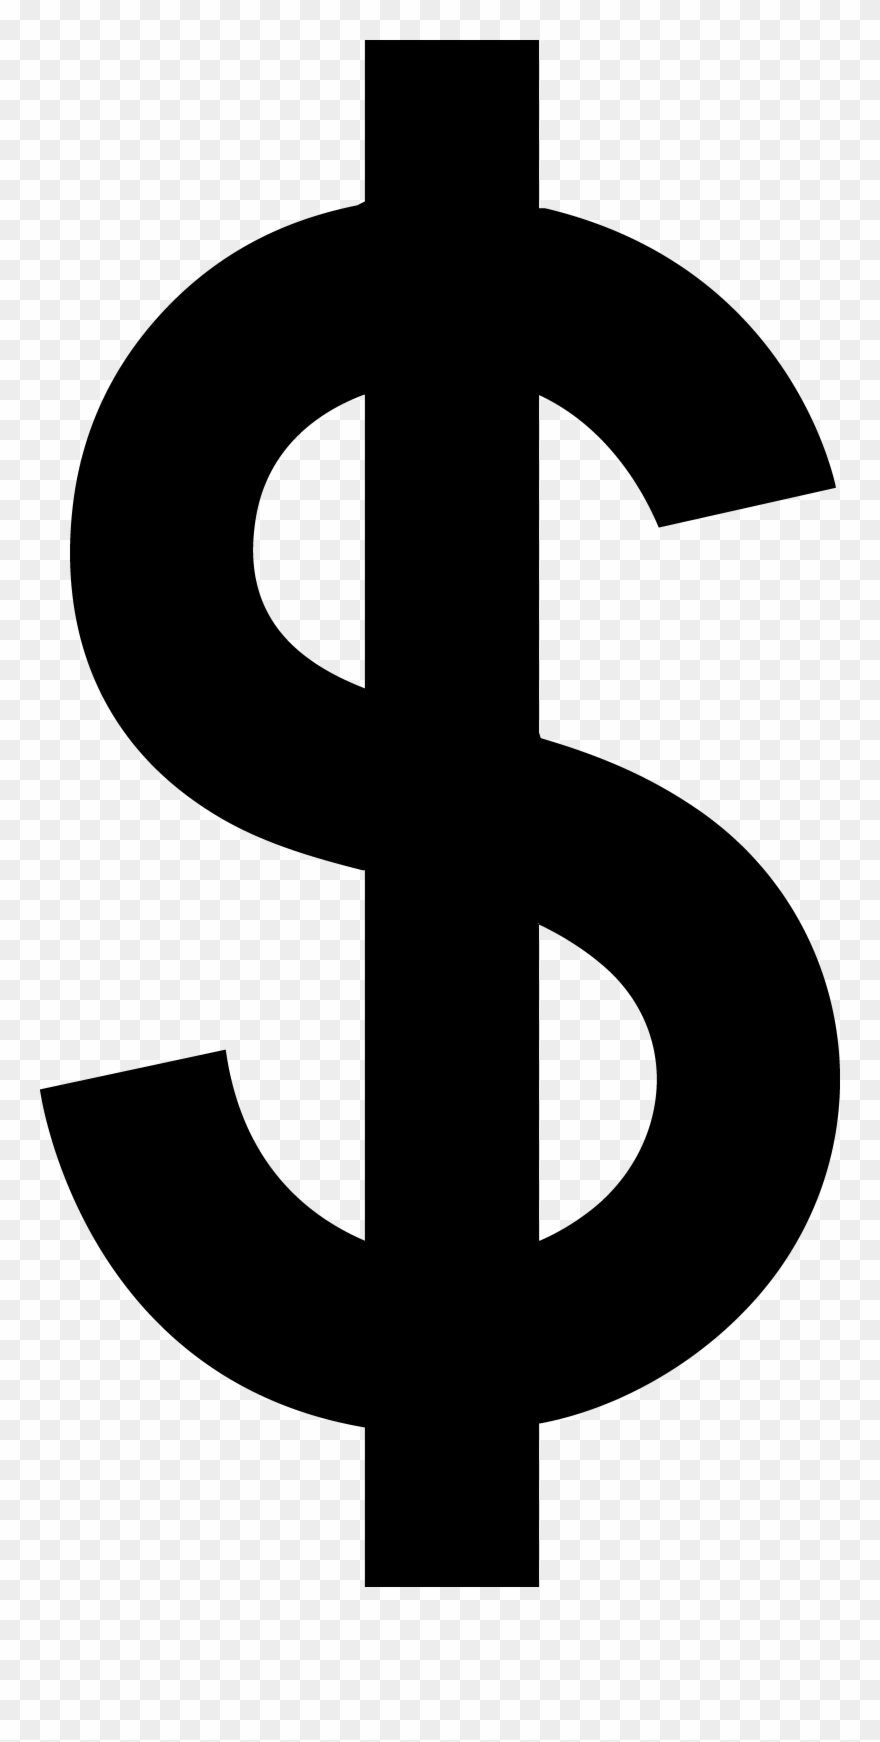 Black Dollar Sign Silhouette.